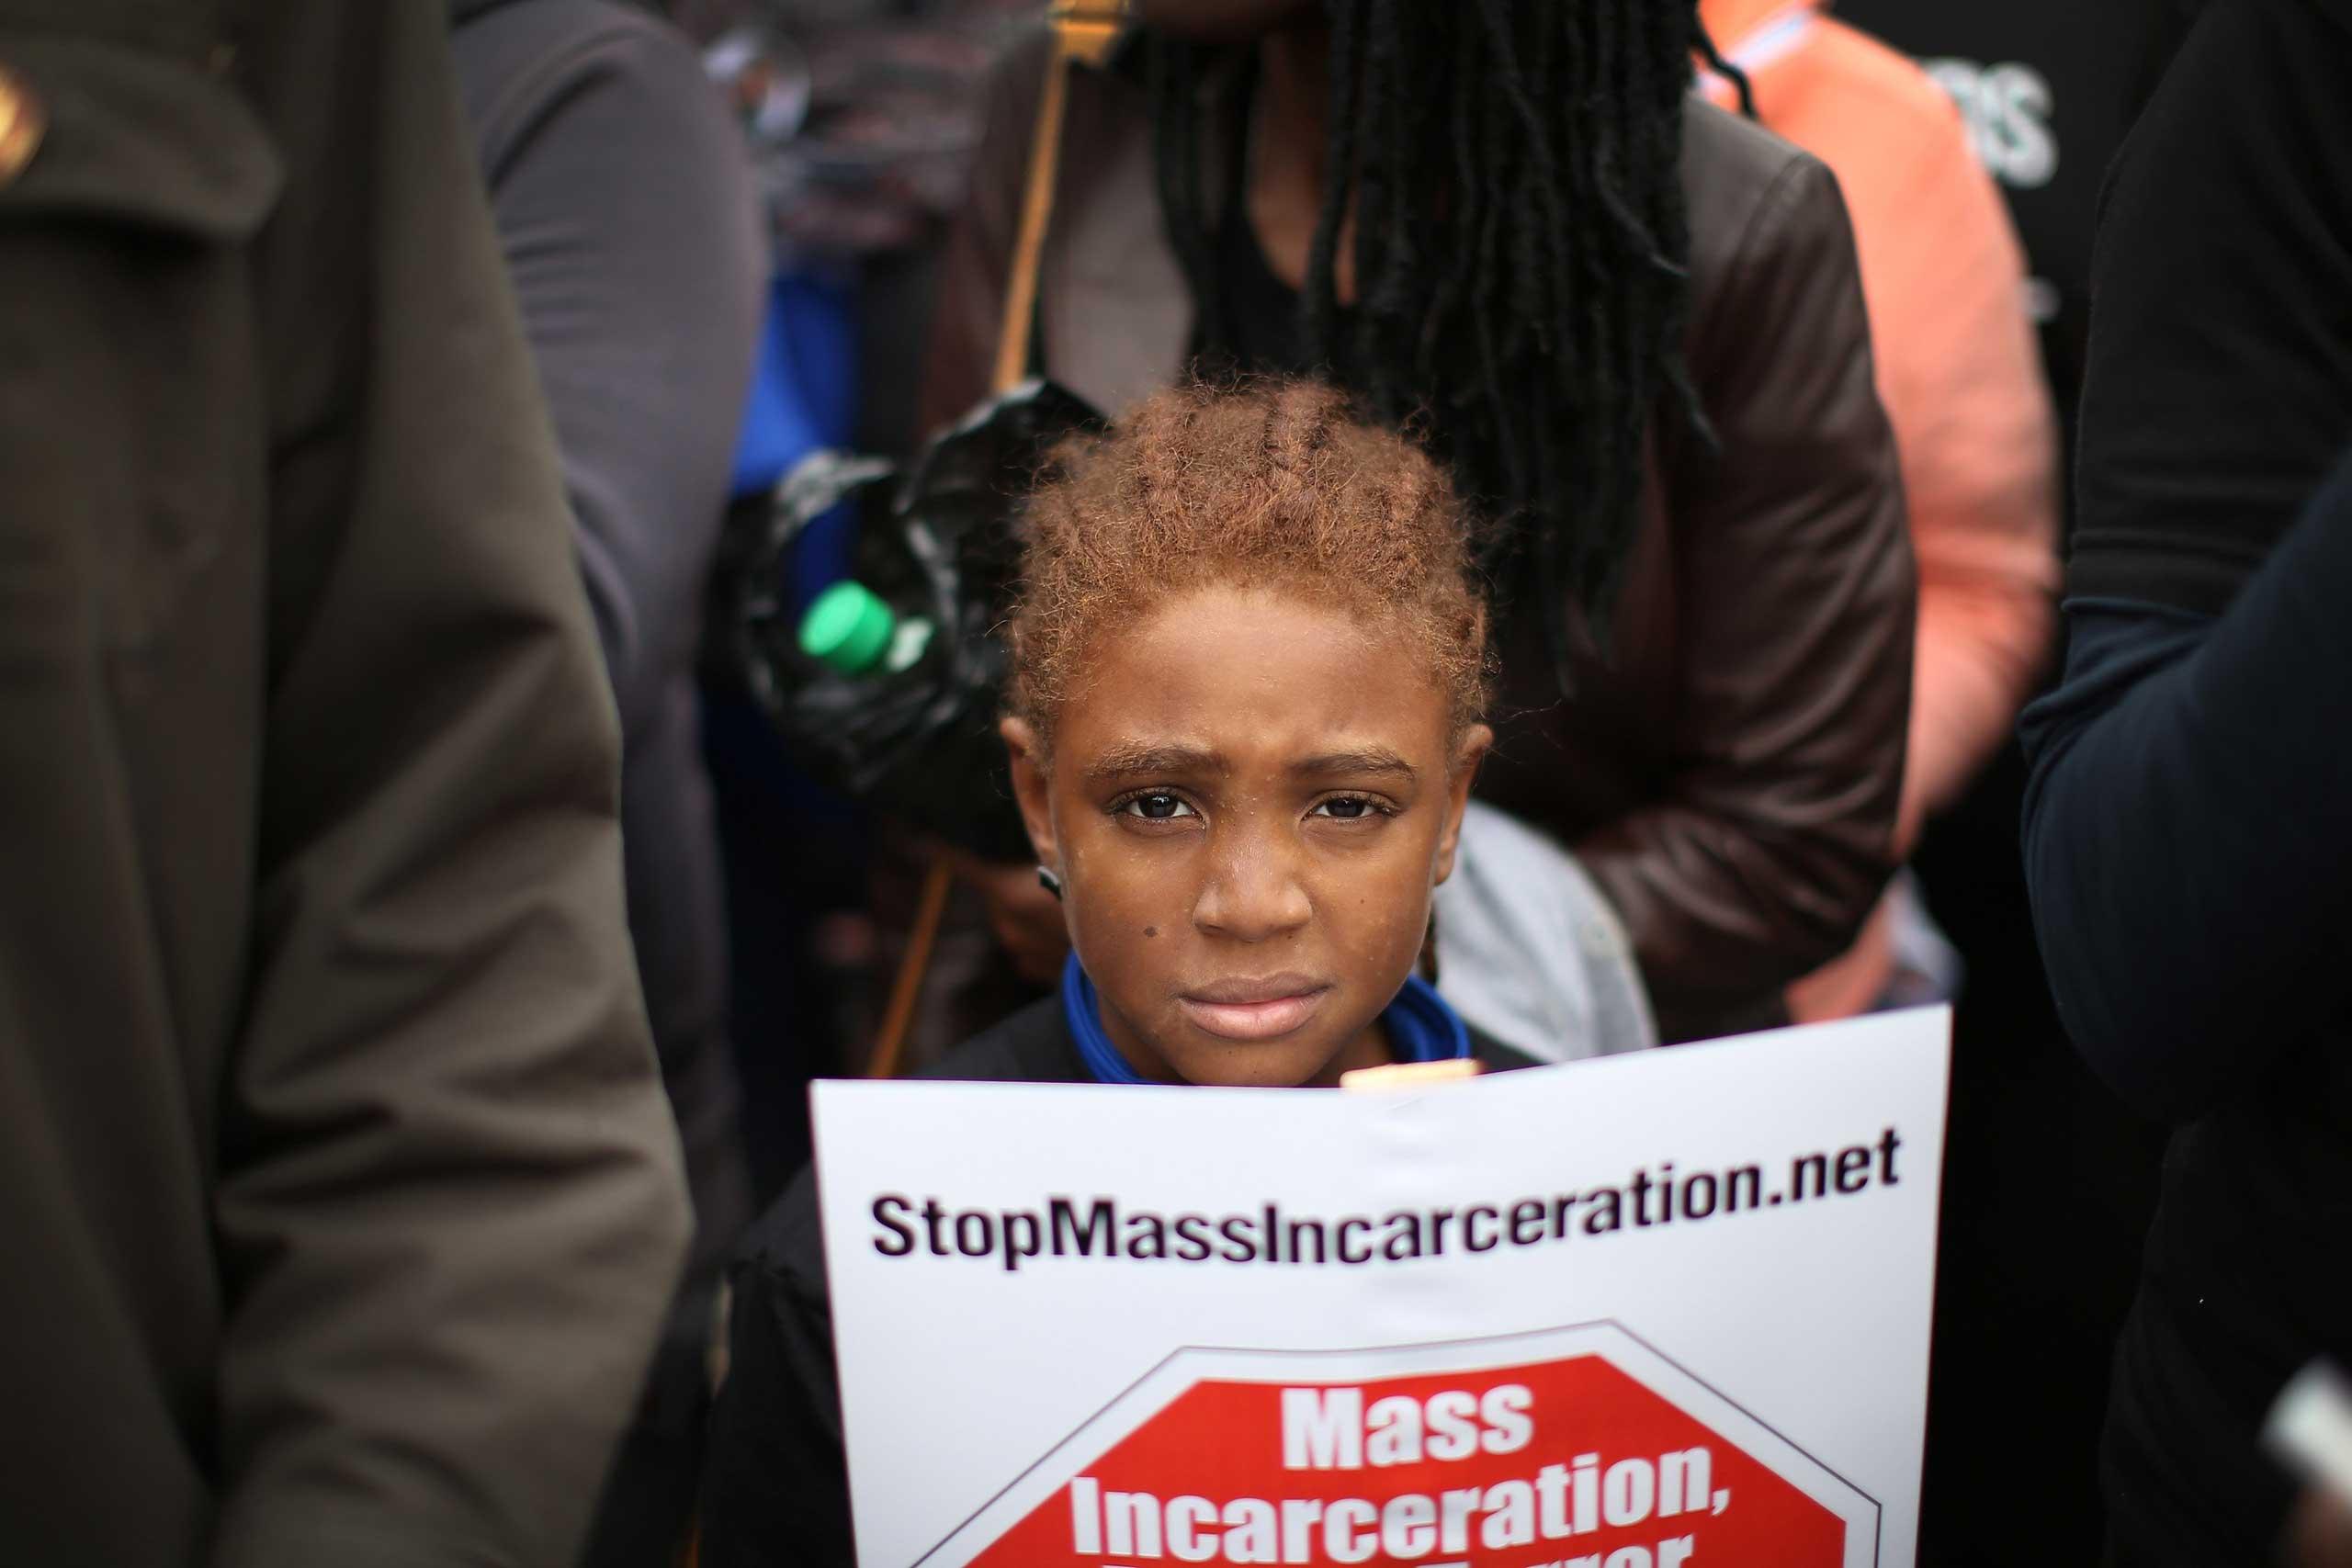 Nine-year-old Bill Jackson joins demonstrators in St. Louis on Oct. 11, 2014.